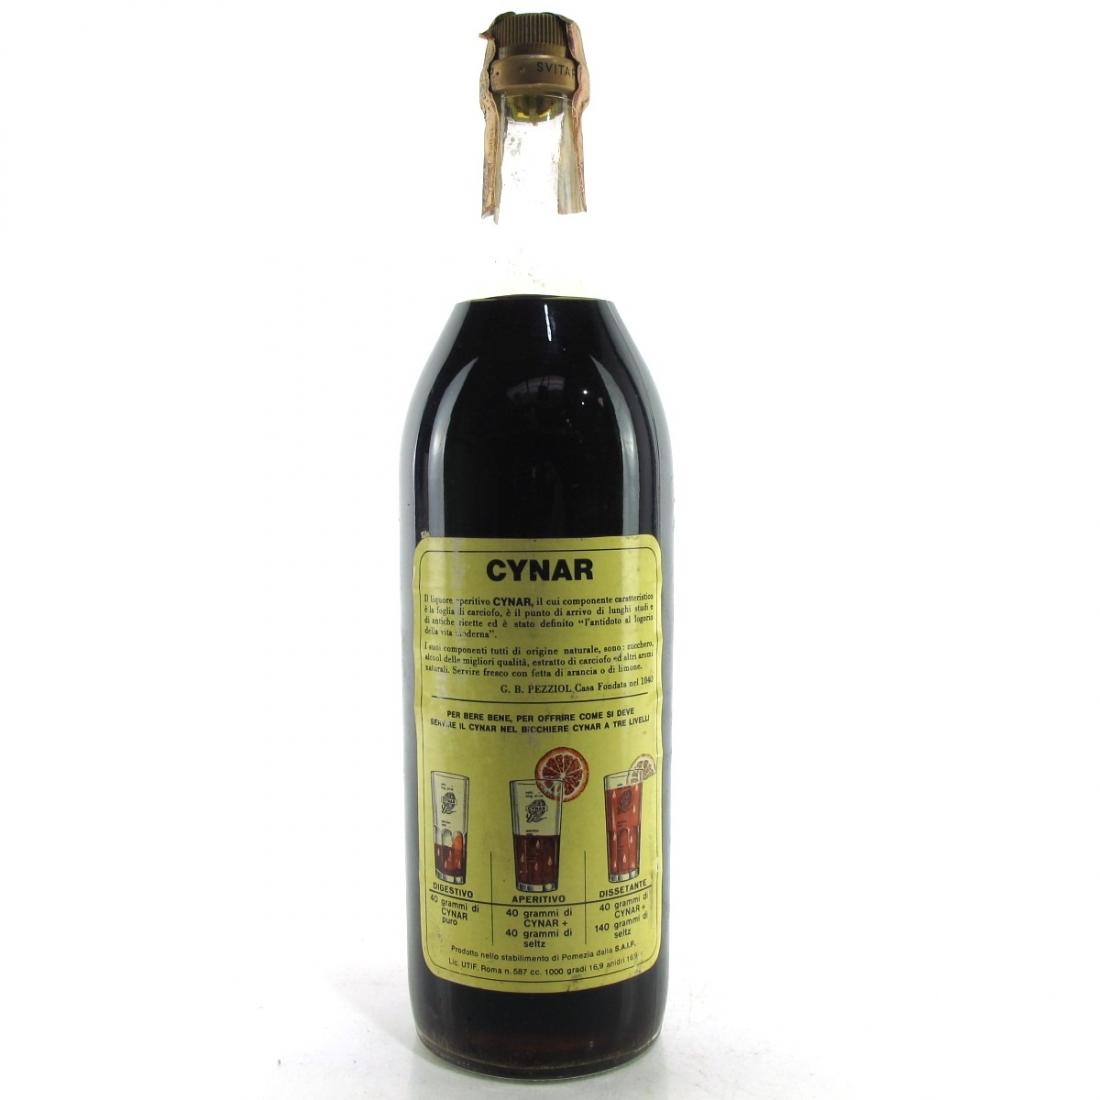 Pezziol Cynar Artichoke Liqueur 1960s